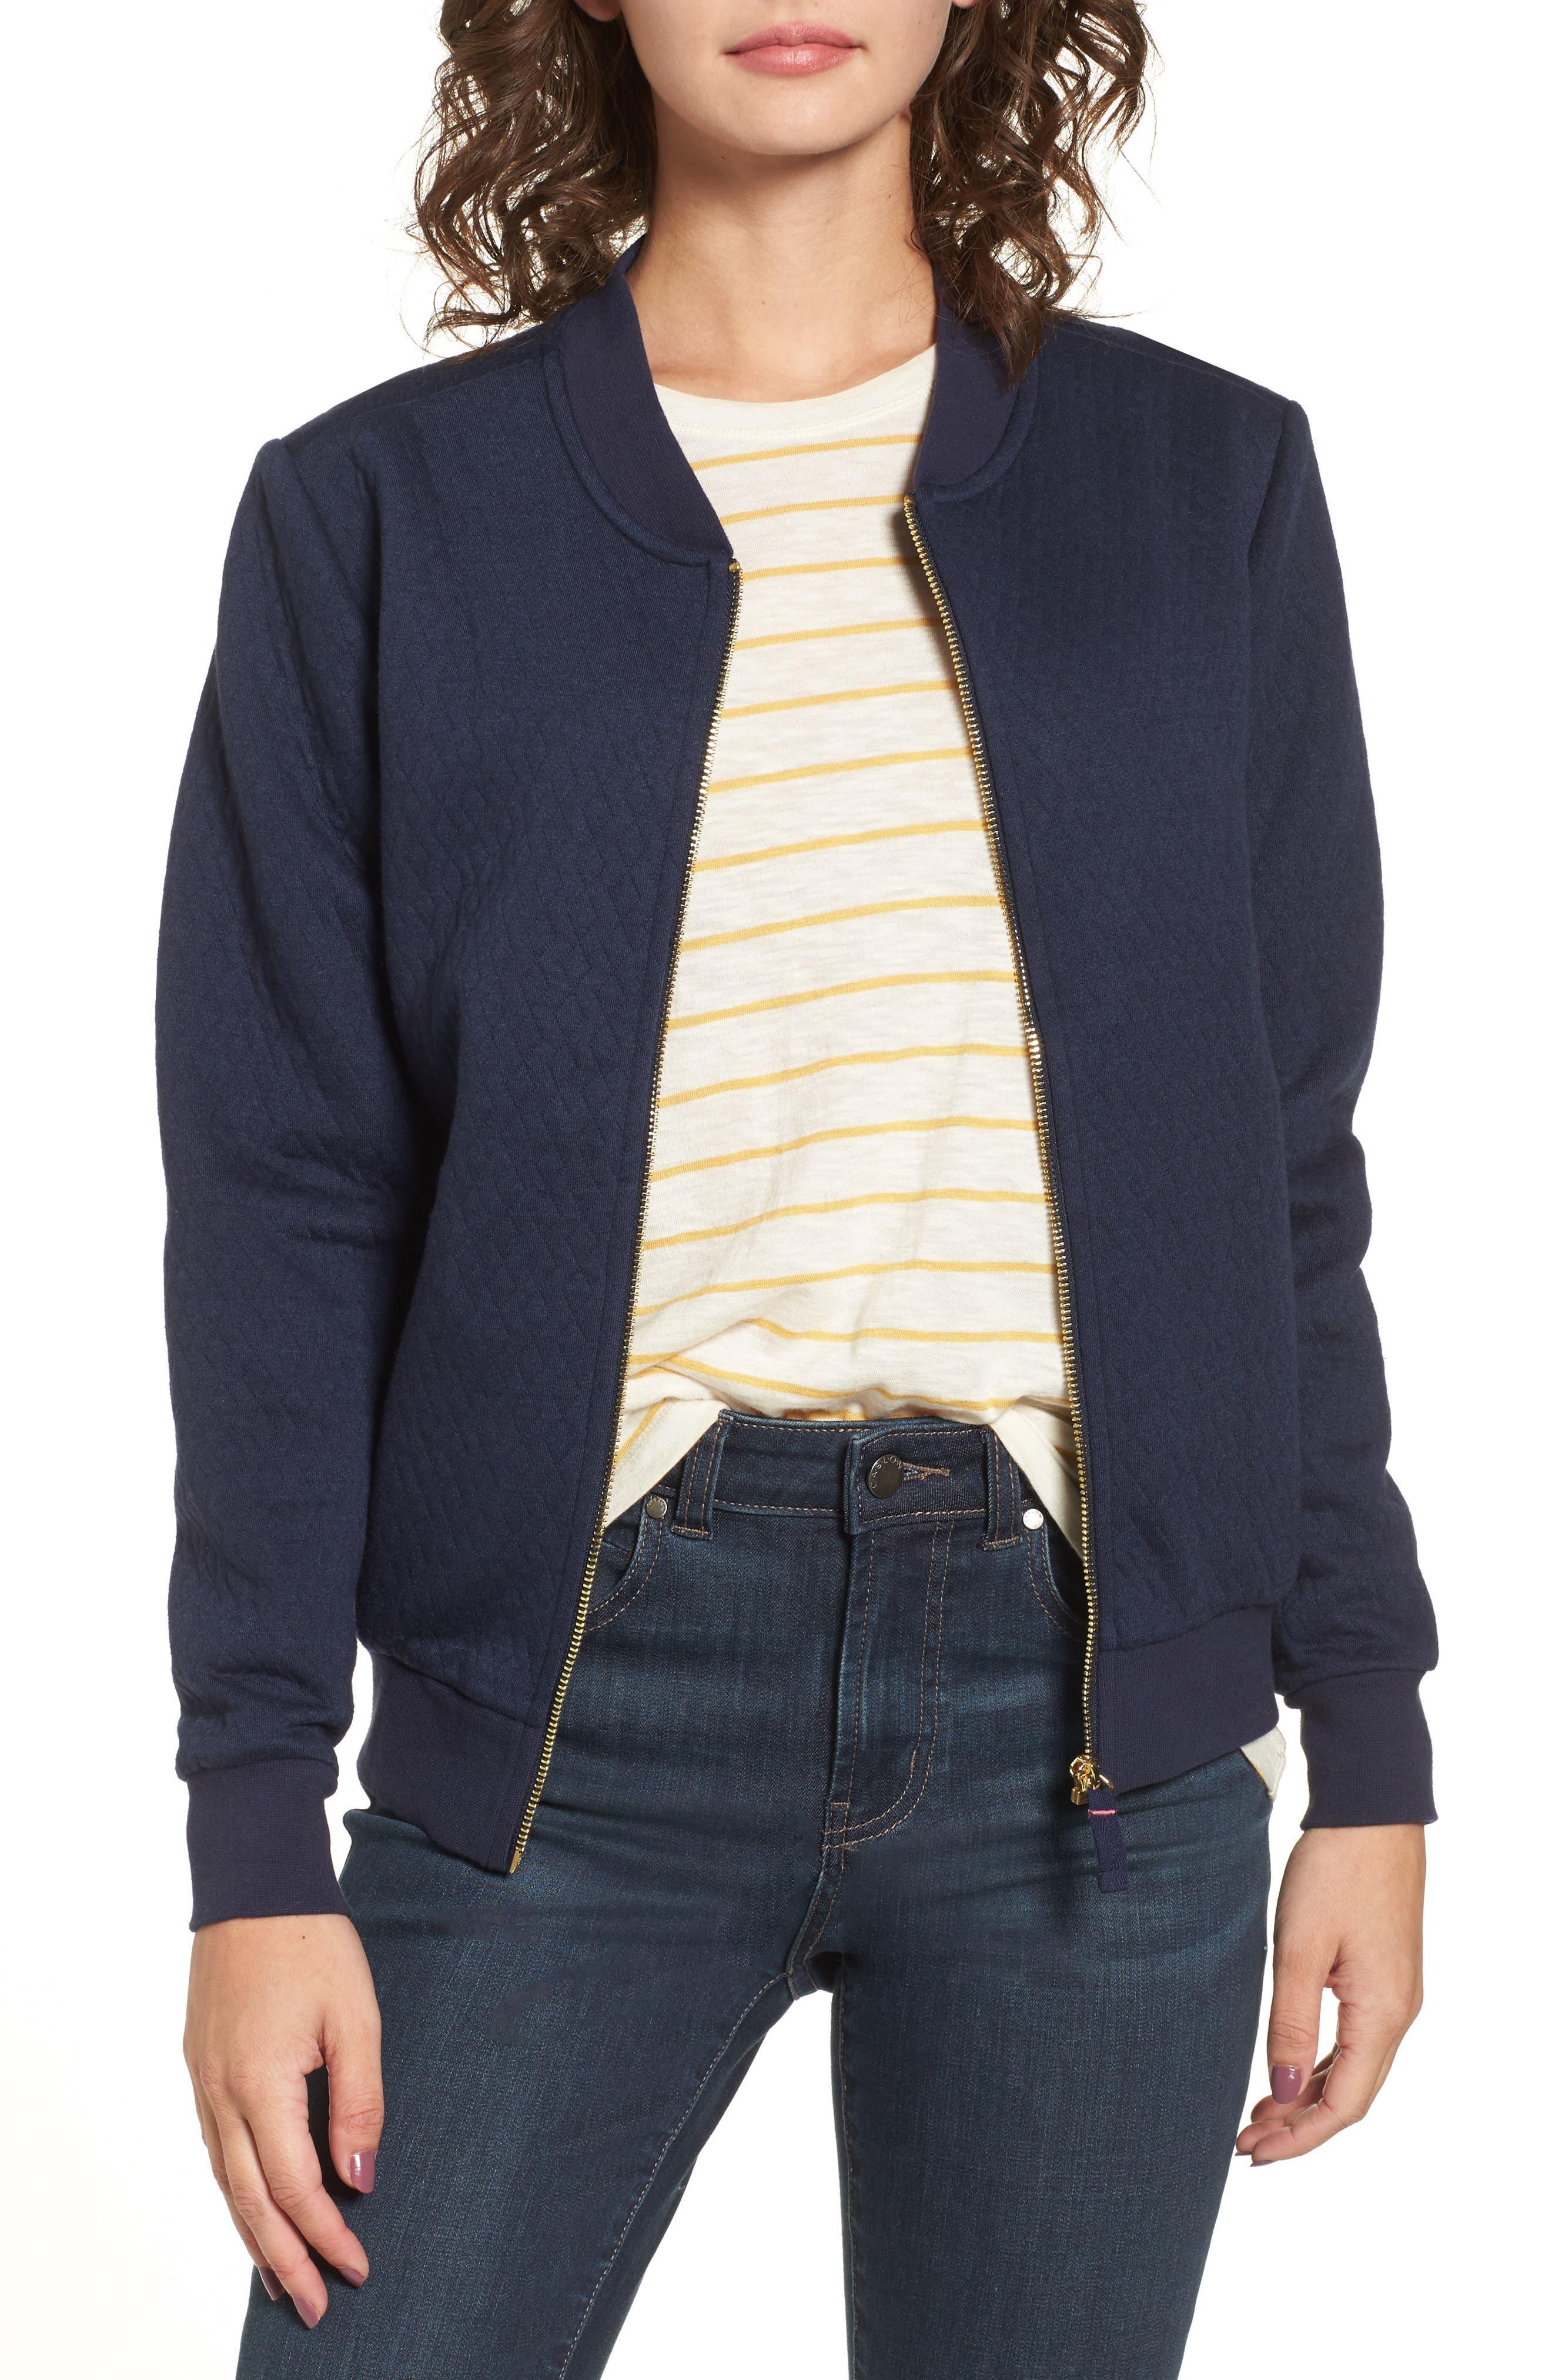 Alternate Image 1 Selected - Joules Millie Bomber Sweatshirt Jacket